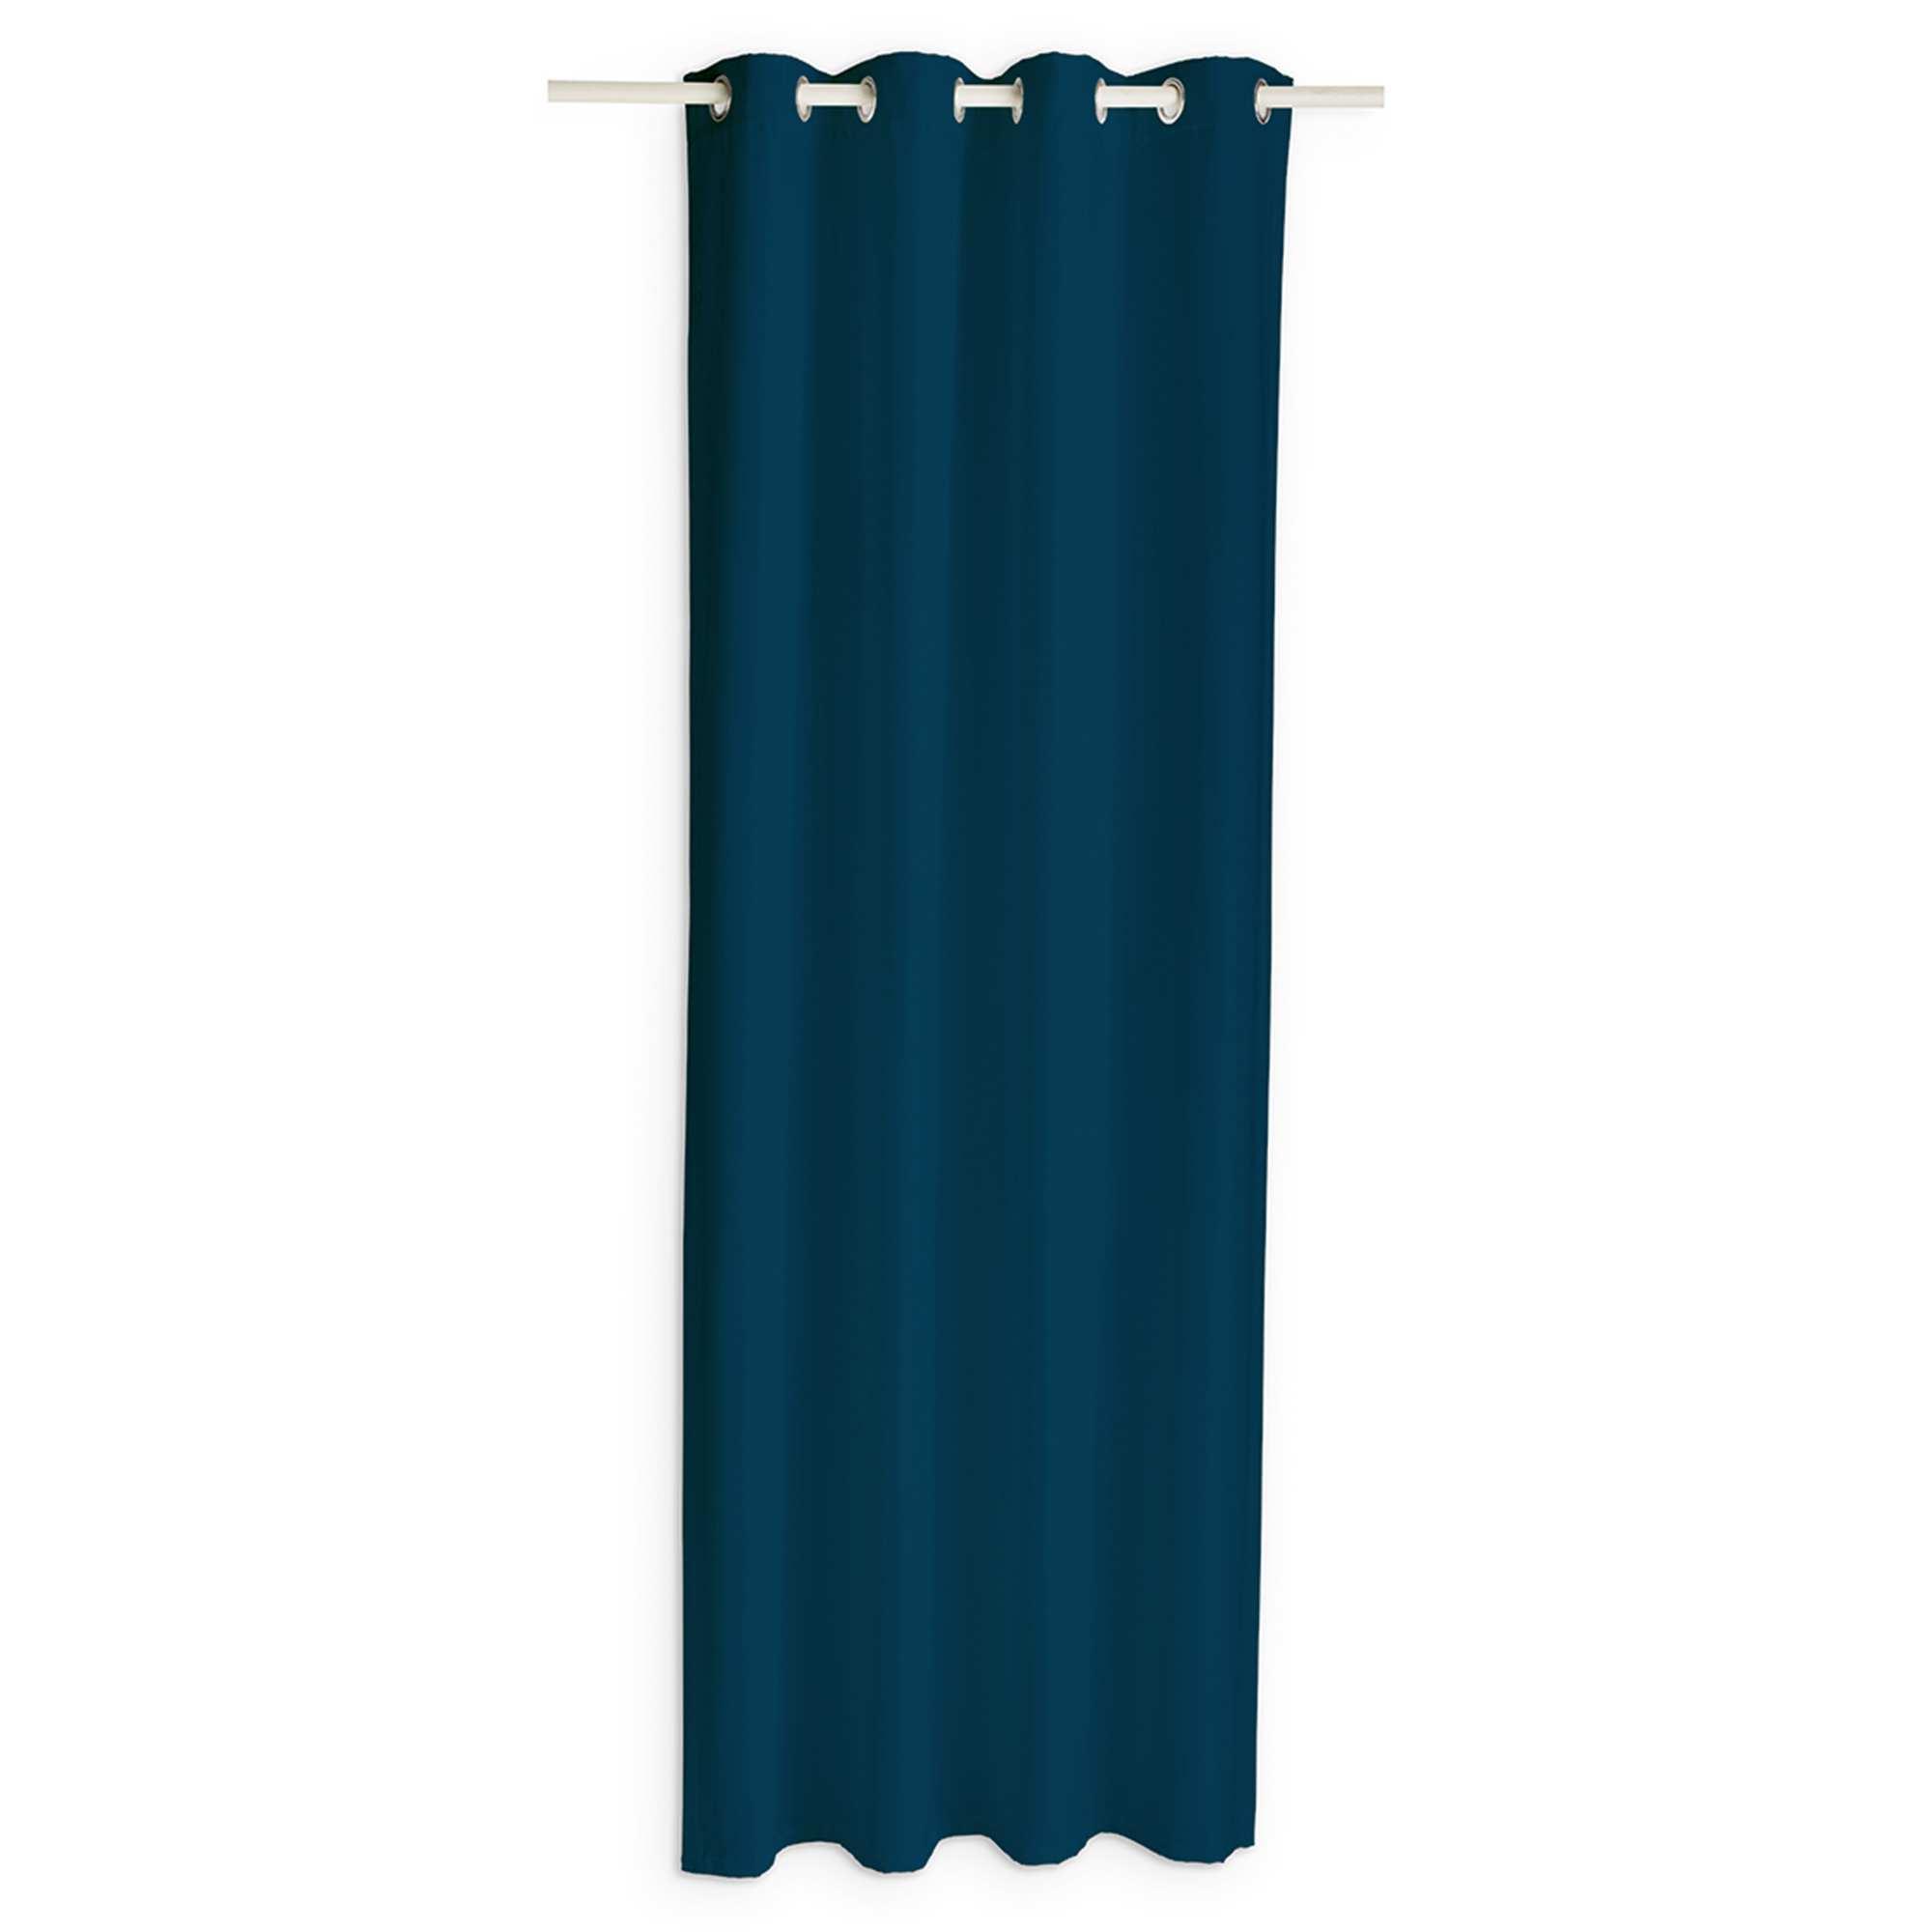 Cortina Ocultante Casa Azul Marinho Kiabi 19 99